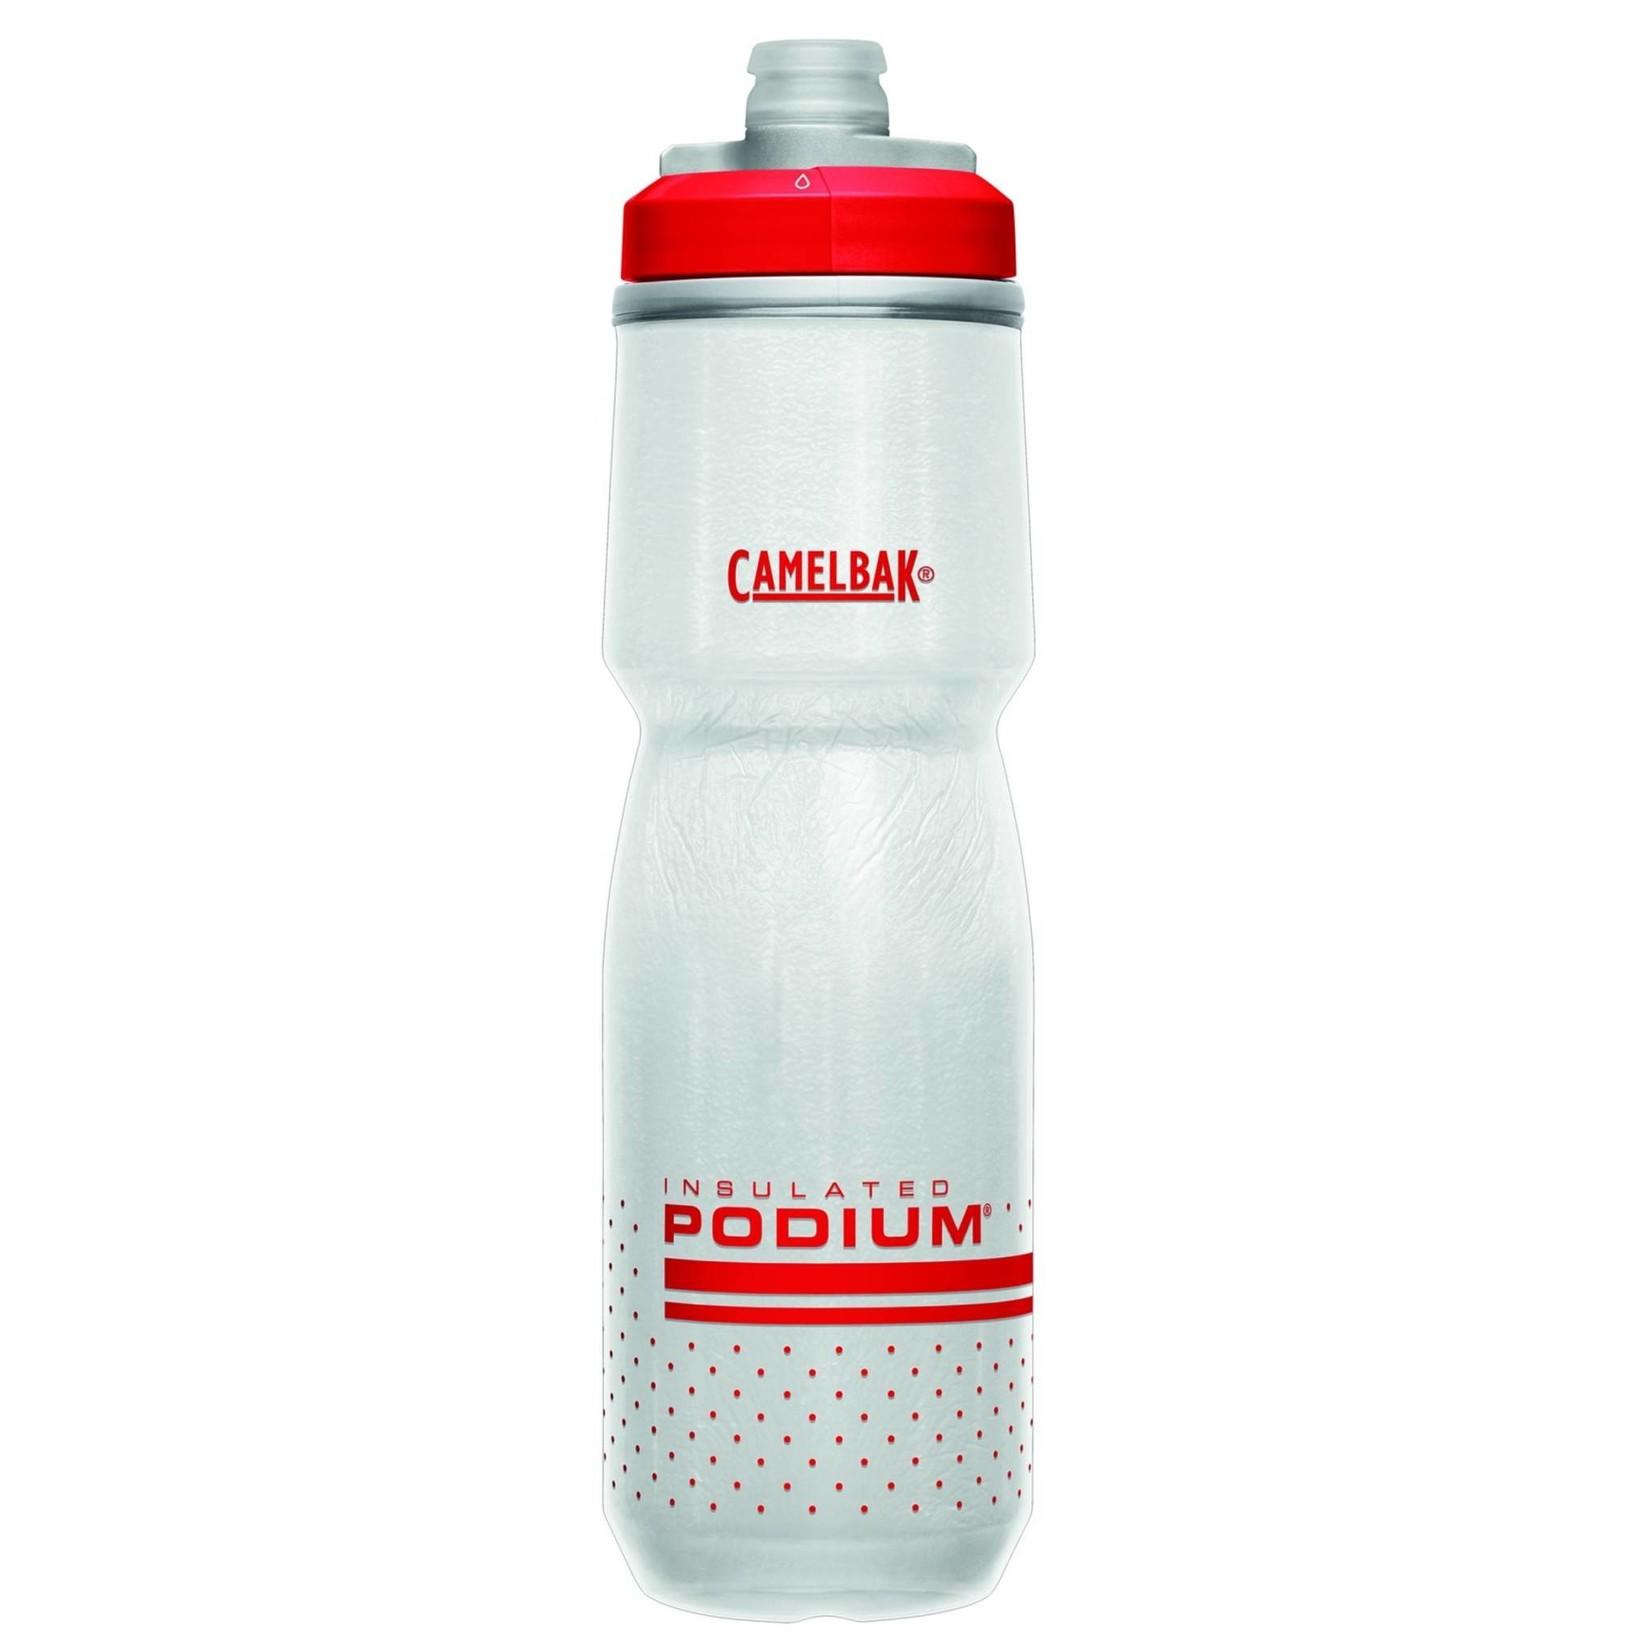 Camelbak Podium Big Chill Water Bottle  Red 710ml